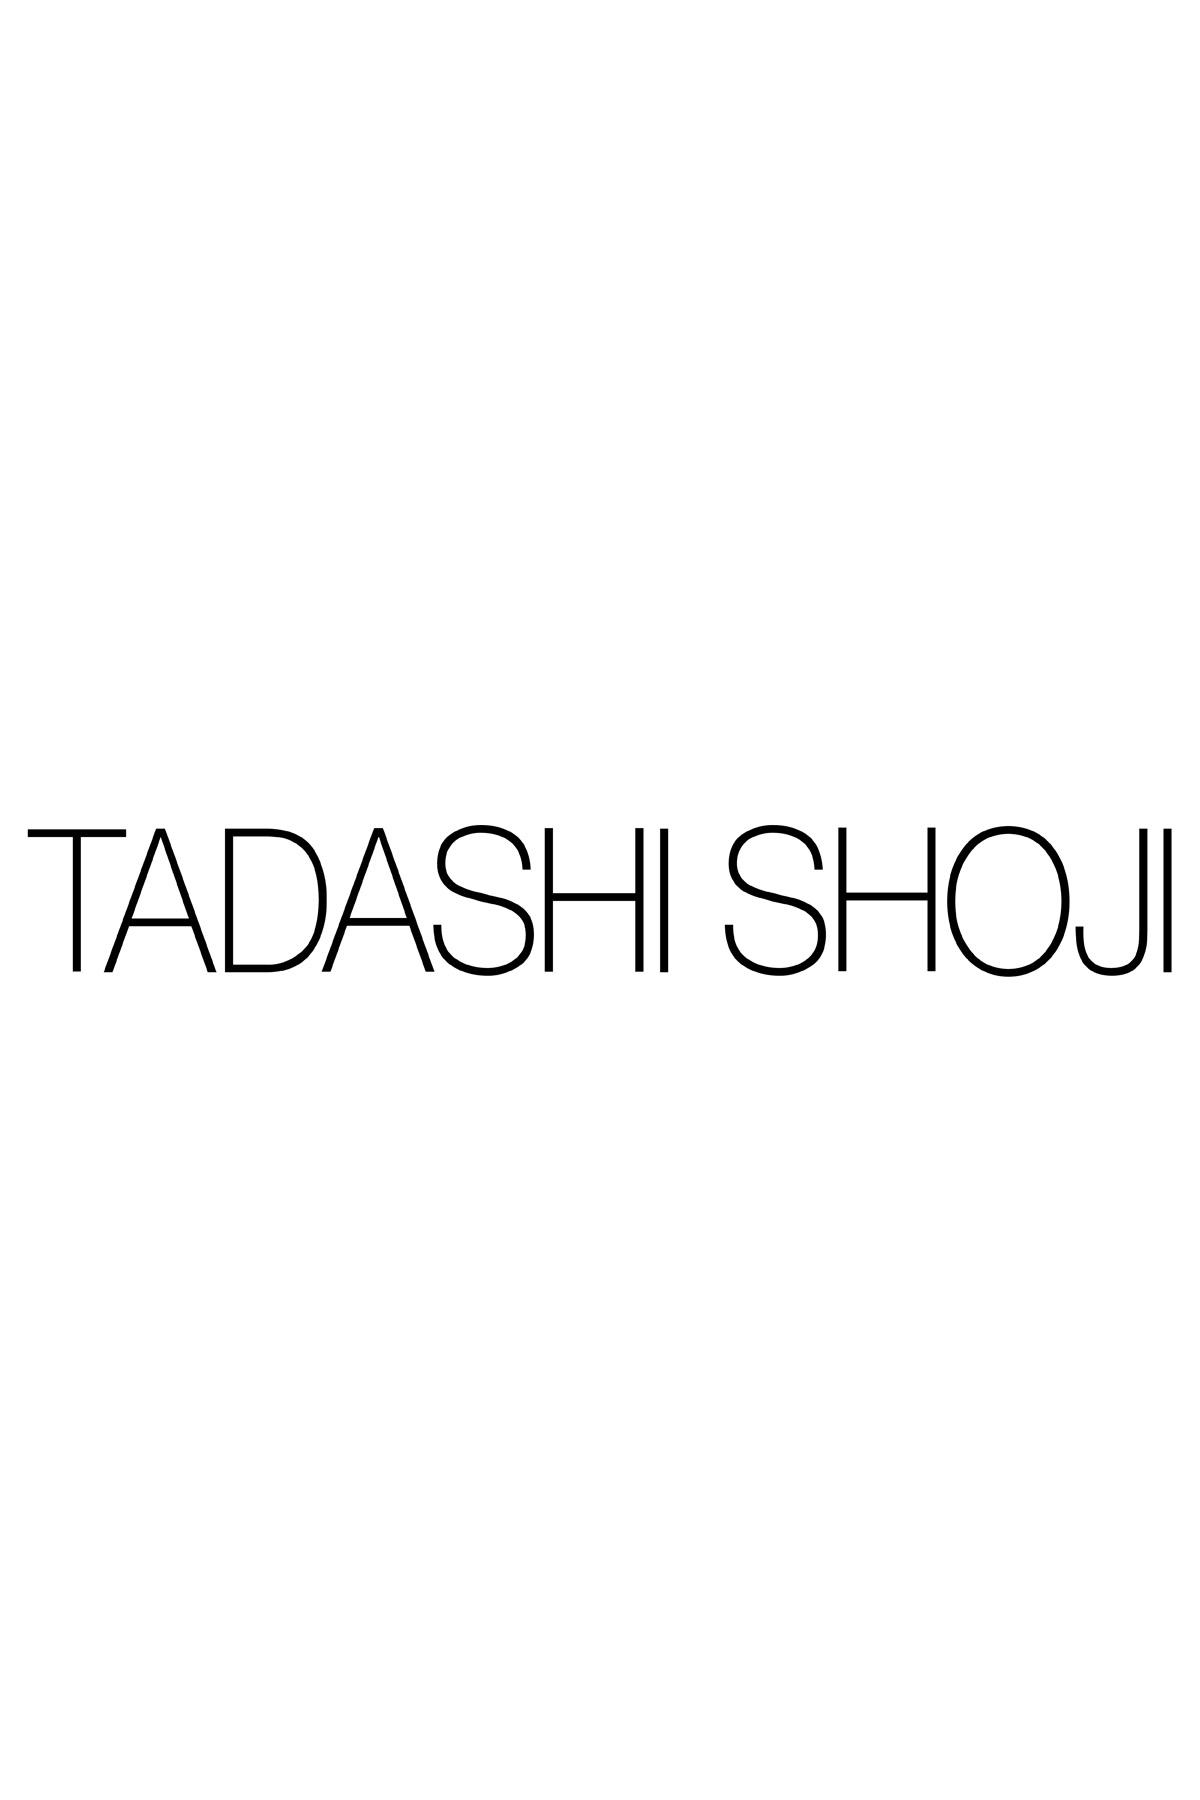 Tadashi Shoji - Vibiana Embroidered Sequin Dress - PLUS SIZE